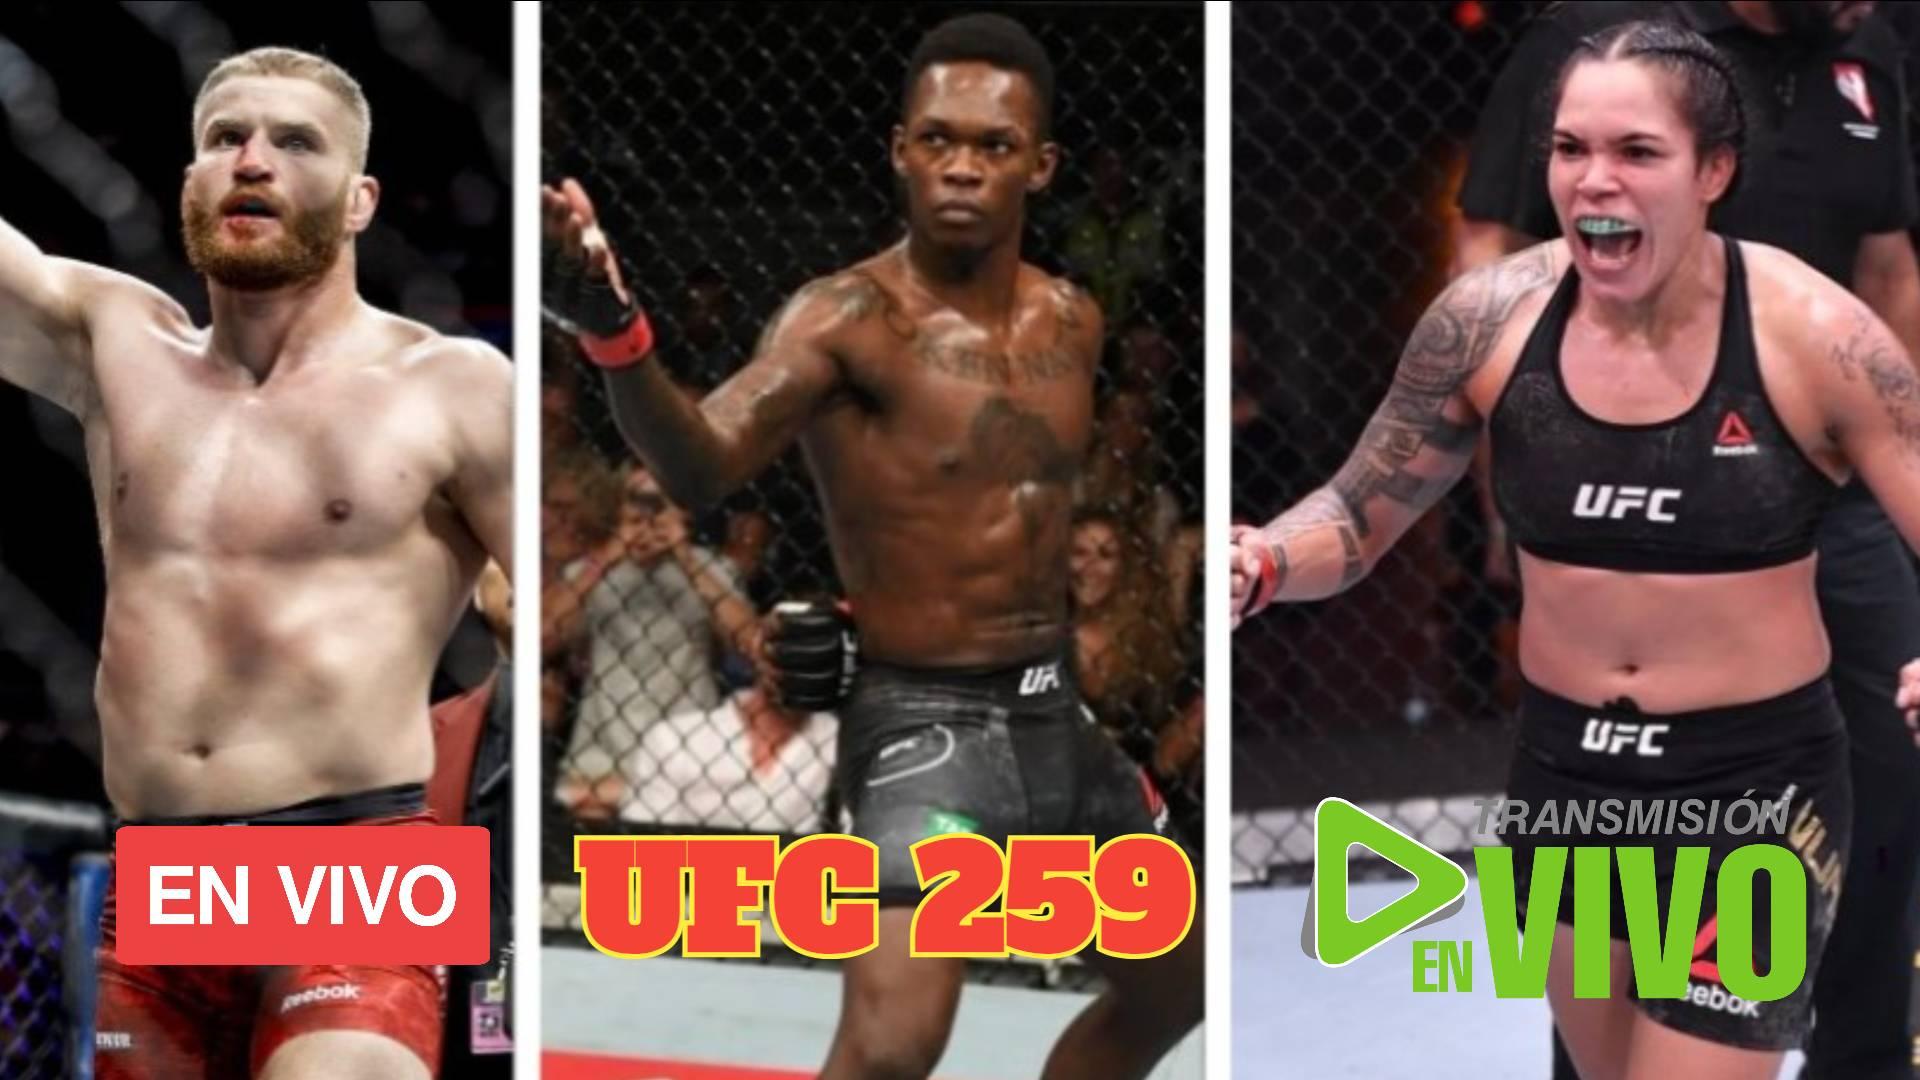 EN VIVO UFC 259 Blachowicz vs. Adesanya ONLINE